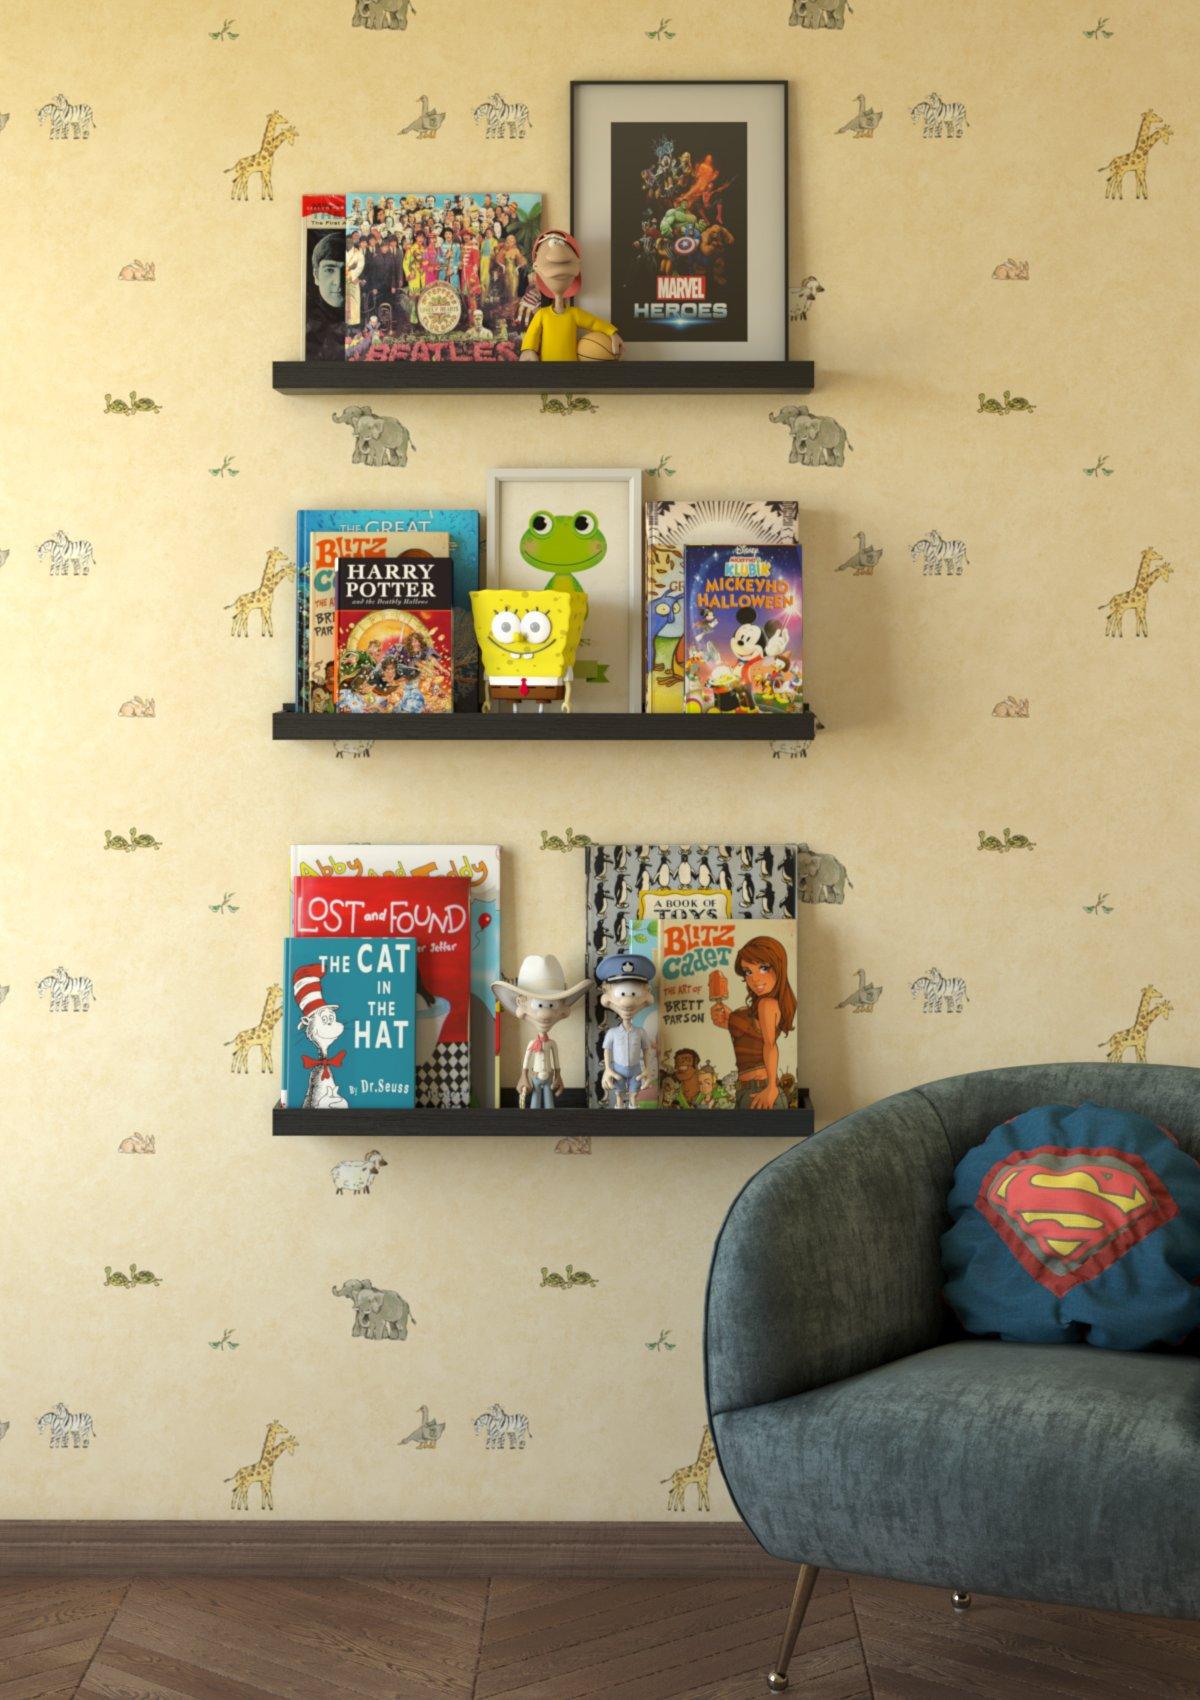 Wallniture Nursery Room Wall Shelf – Floating Book Shelves Decor for ...